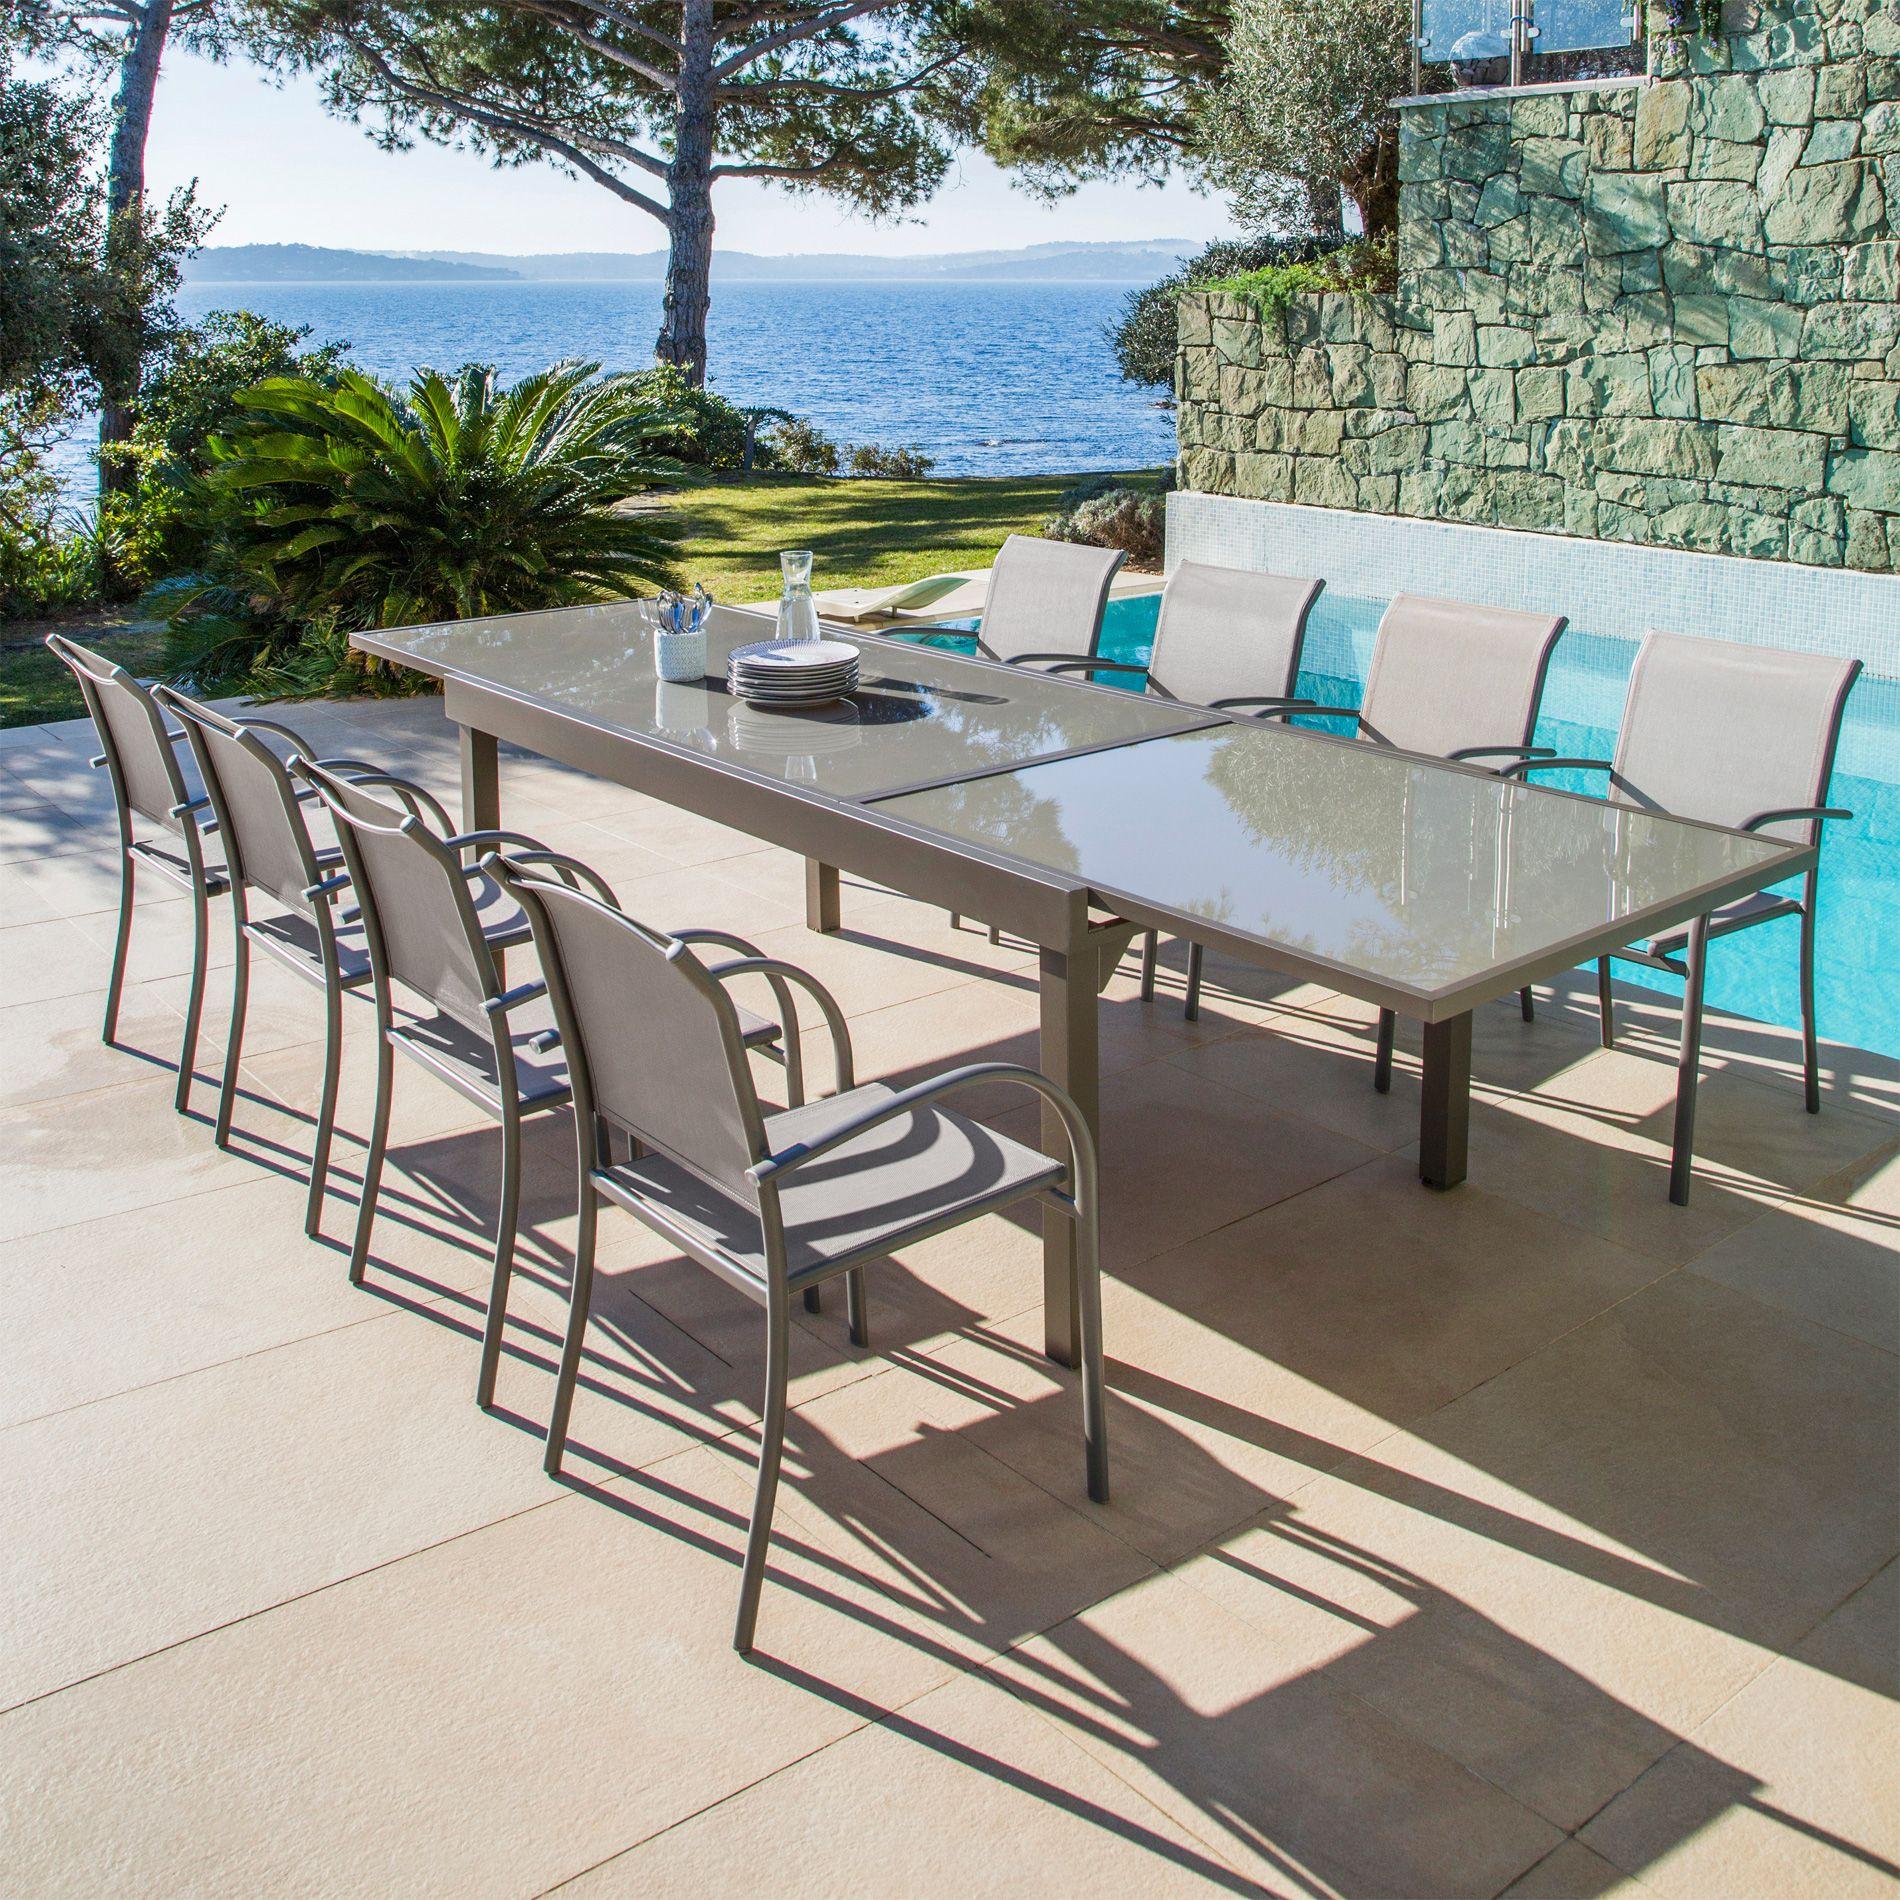 Table de jardin extensible en verre (320 x 90 cm) - Taupe en ...